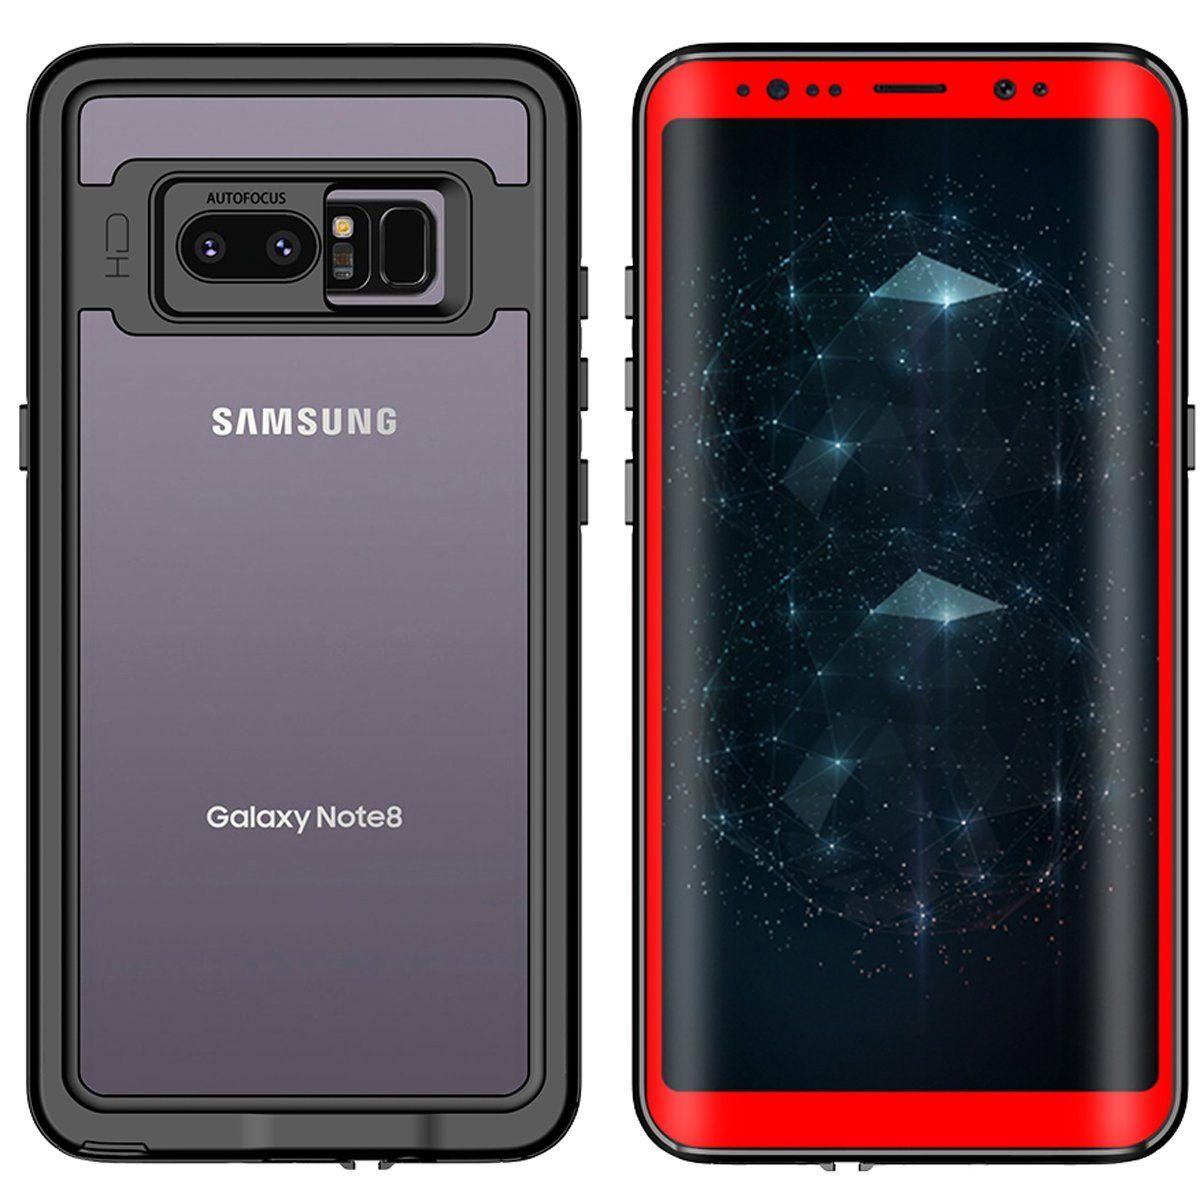 The Best Samsung Note 8 Waterproof Cases In 2020 Review Water Proof Case Samsung Note Samsung